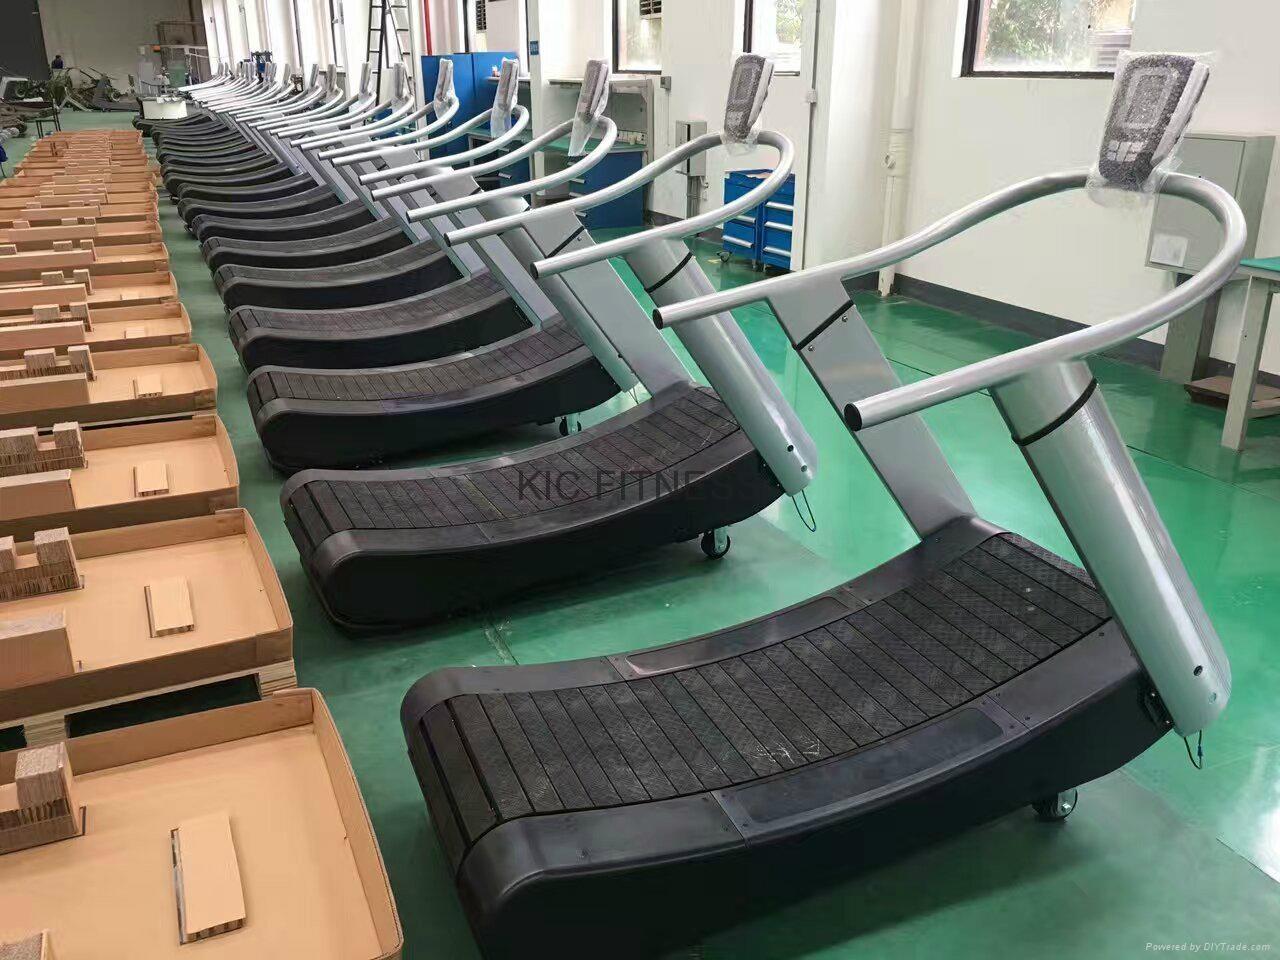 Woodway Treadmill